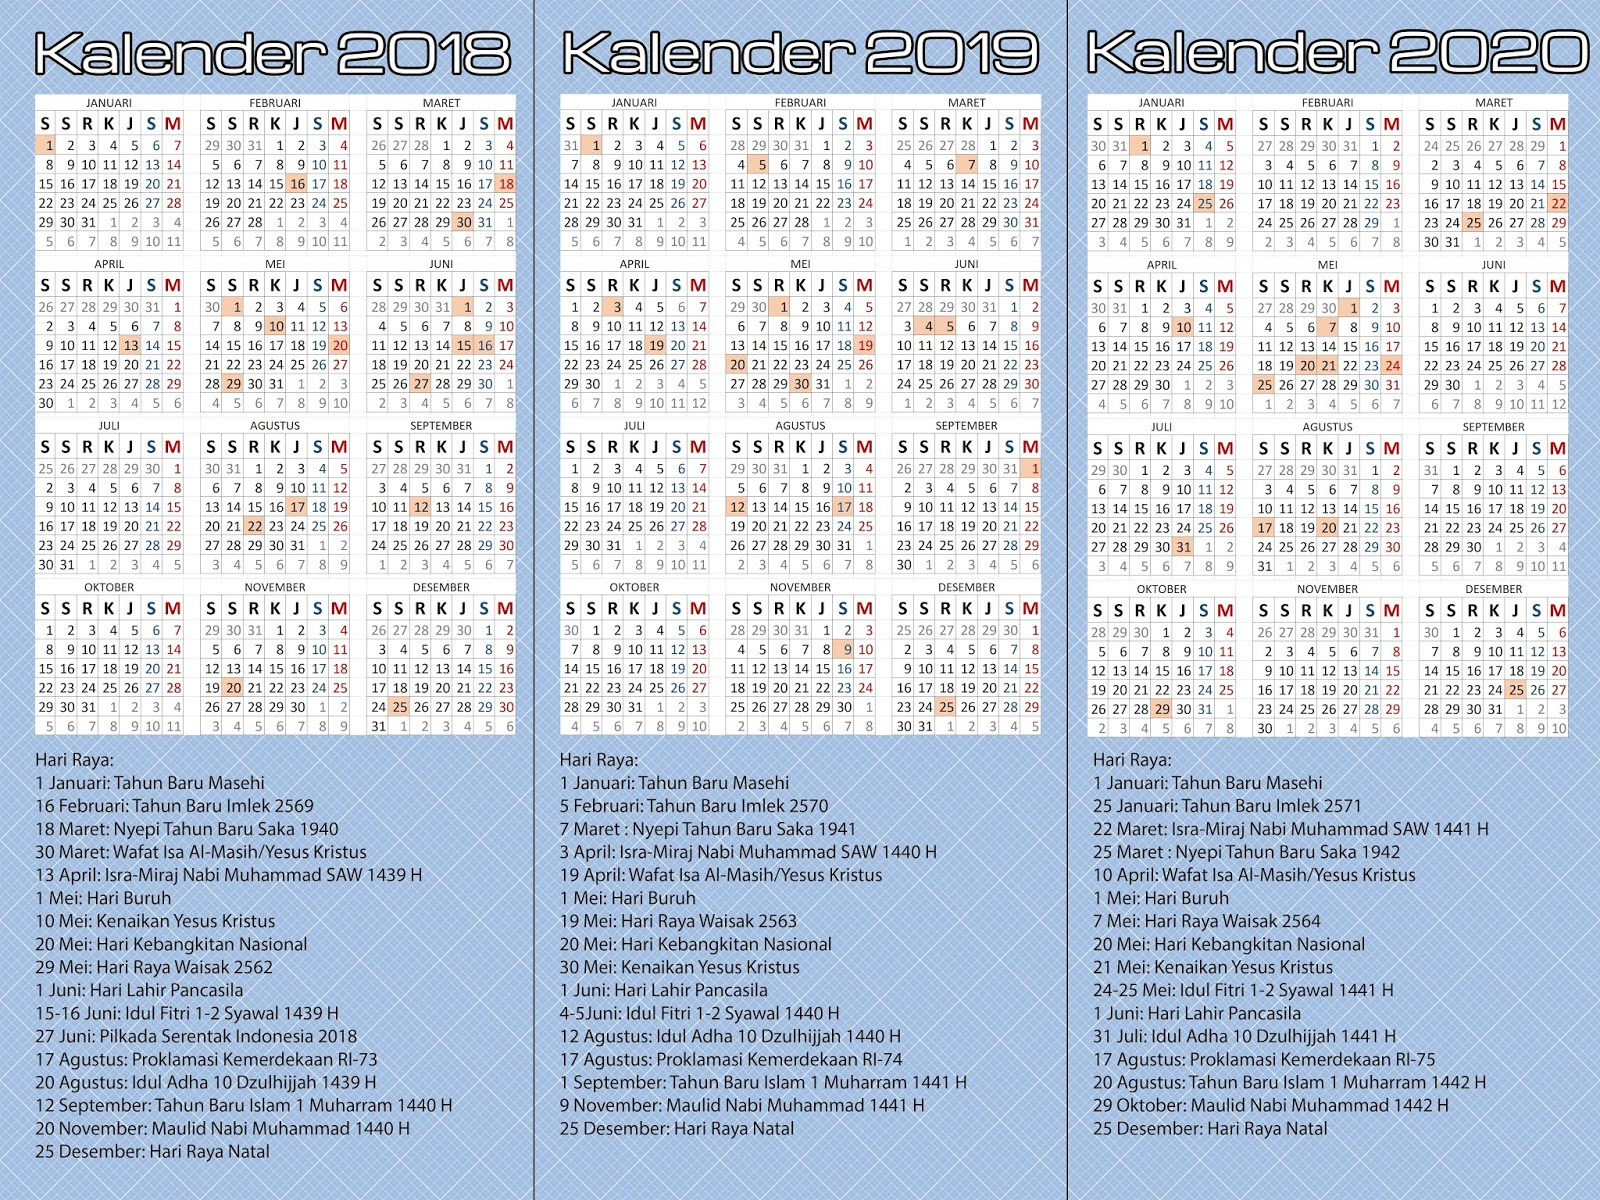 Apabila anda ingin mengunduh Kalender tersebut maka anda dapat mengklik kanan dan Open Link in New Tab lalu pada Tab Gambar yang telah diklik